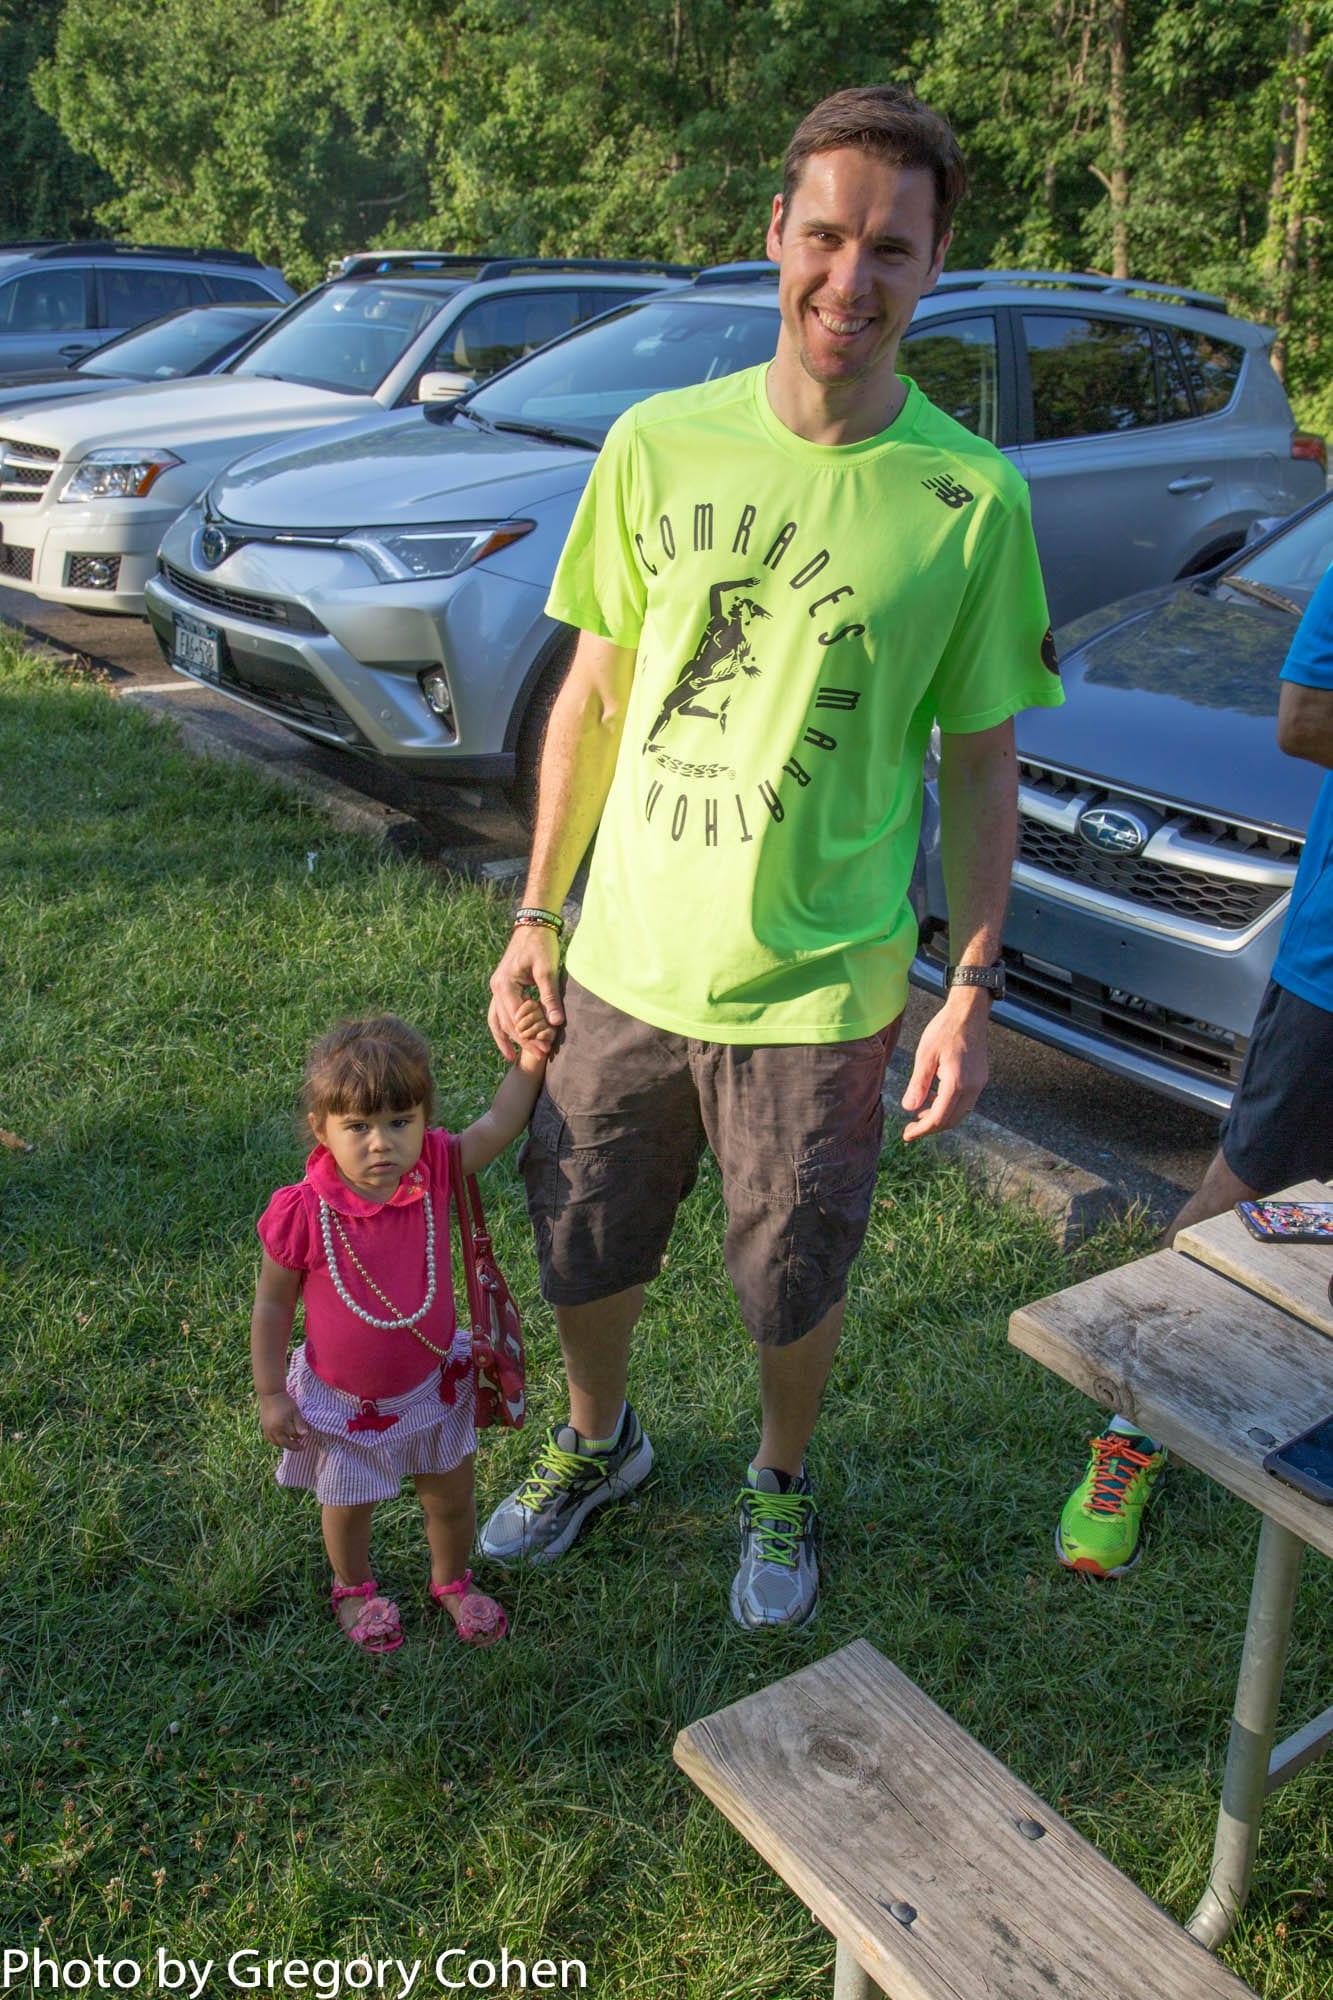 007 - Putnam County Classic 2016 Taconic Road Runners - IMG_7387